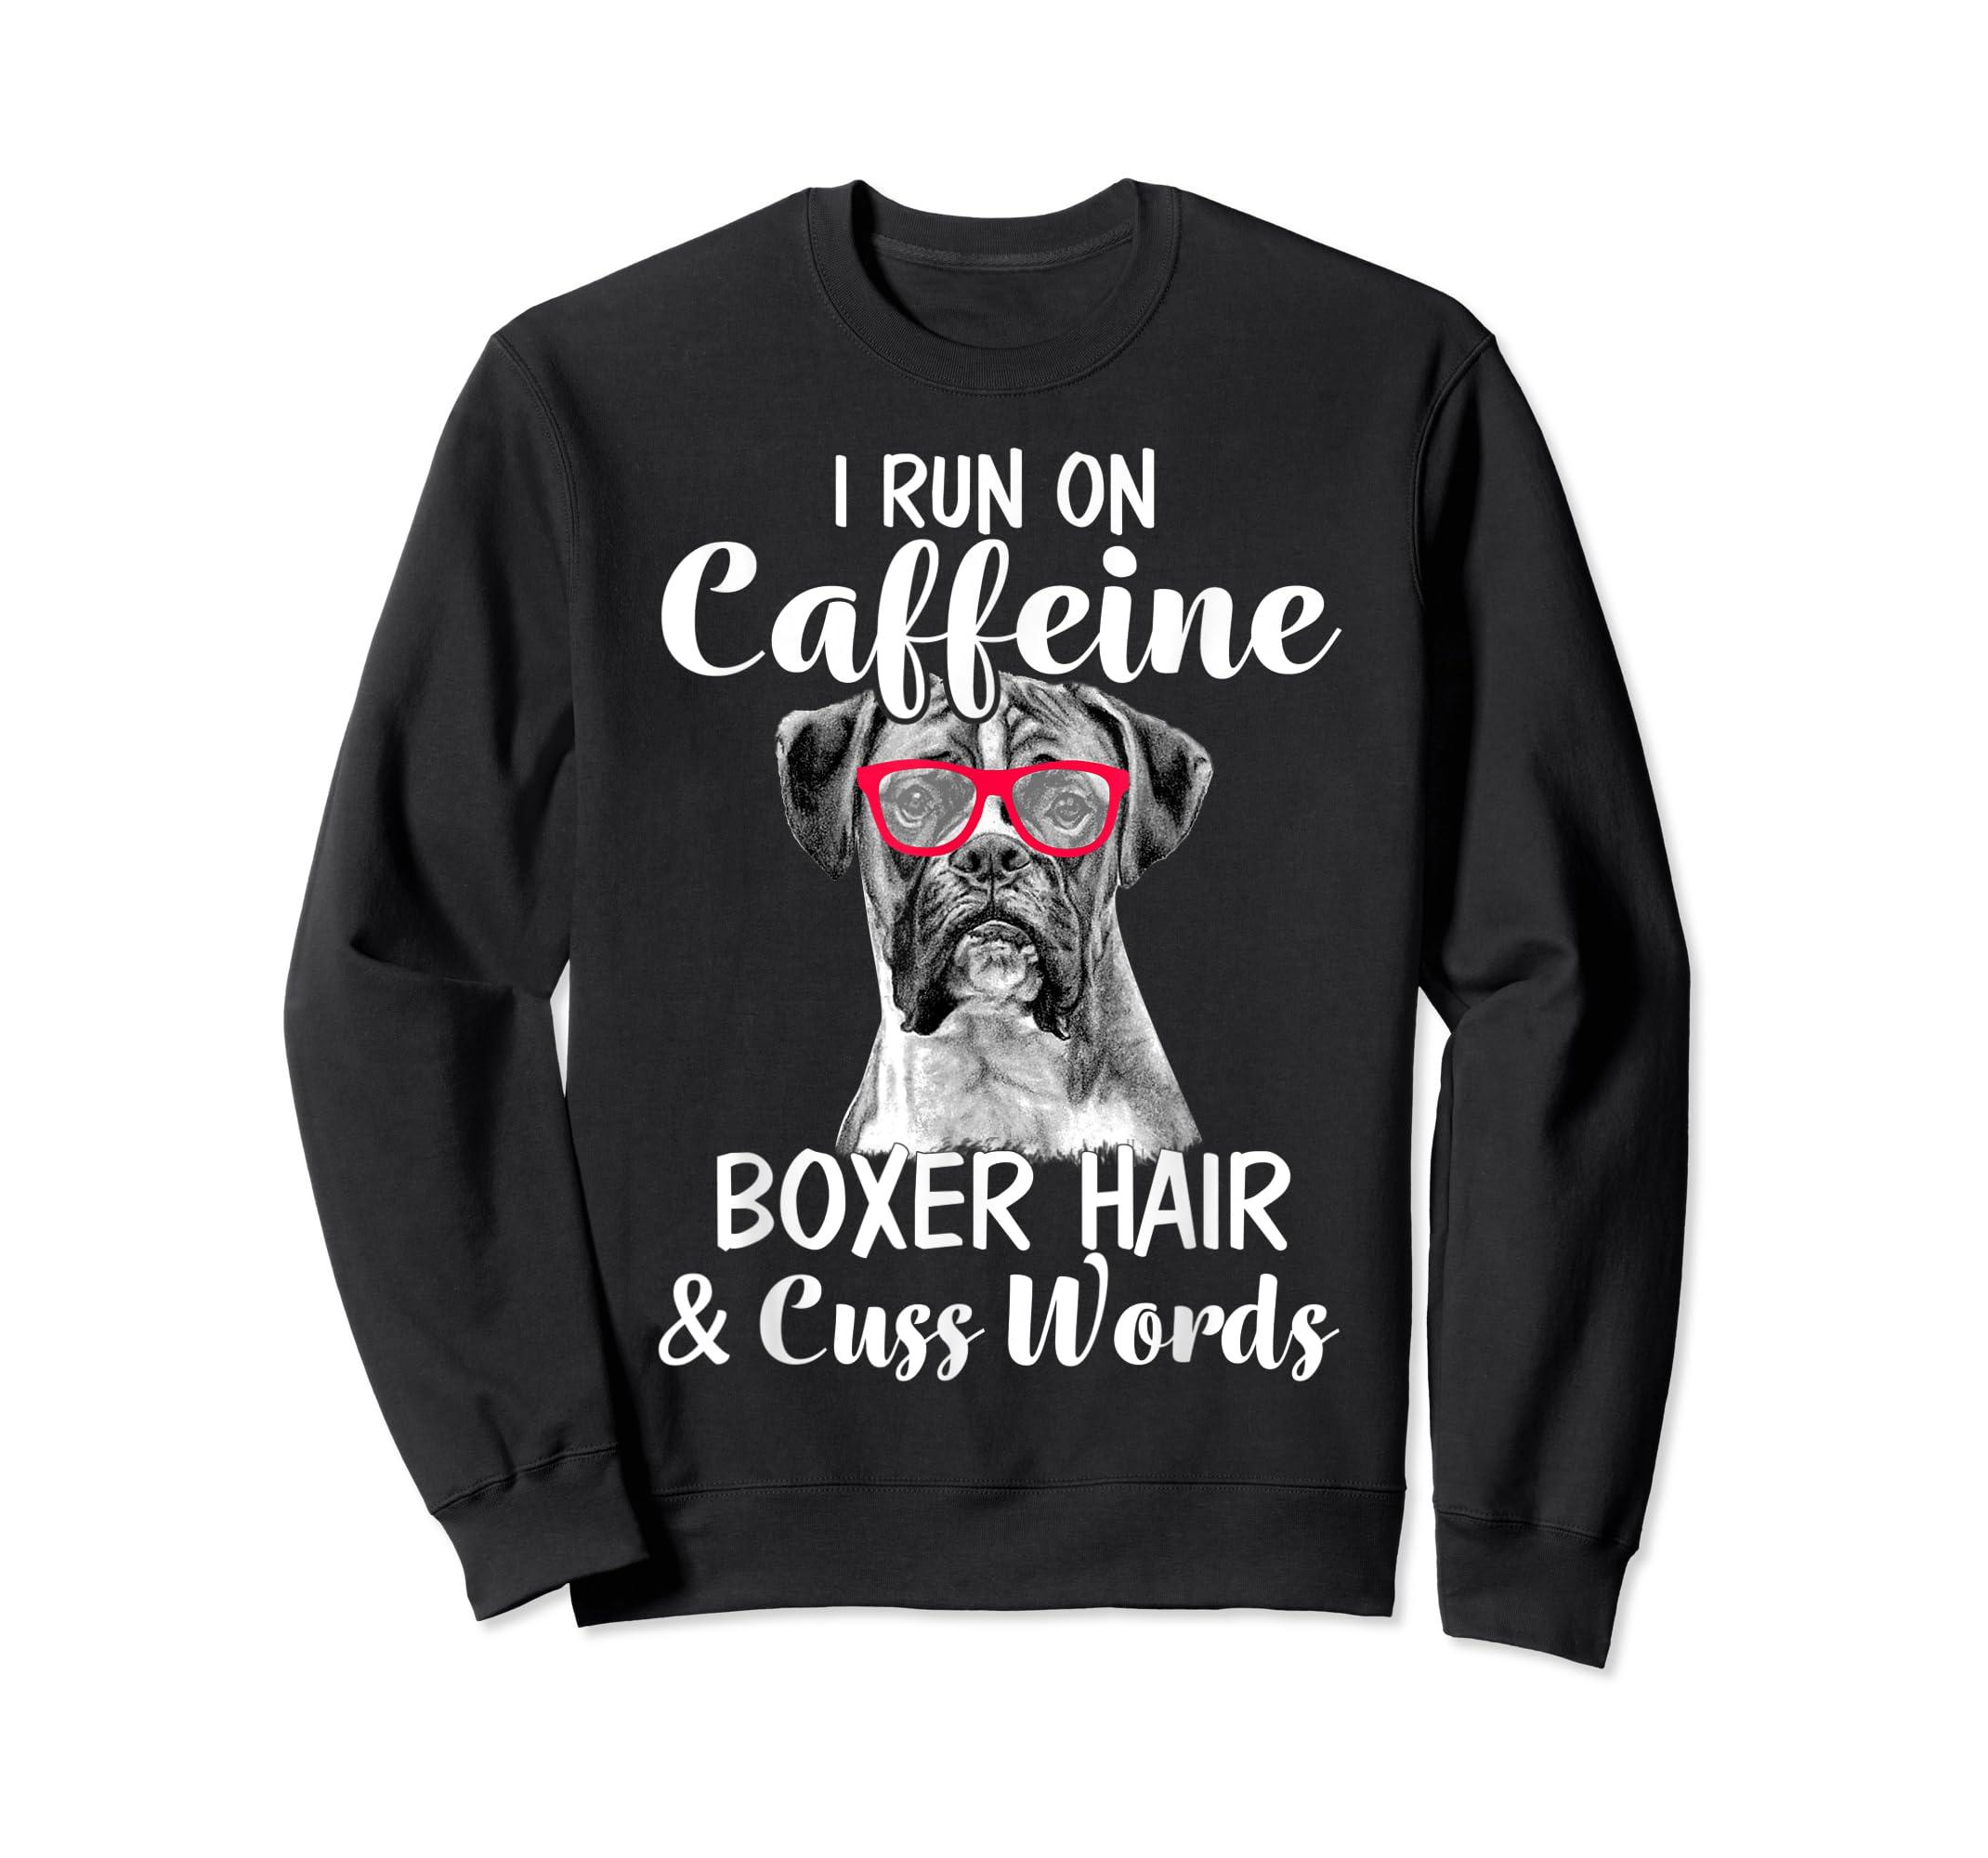 I Run On Caffeine Boxer Hair Mom Tshirt, Mothers Day Shirt-Sweatshirt-Black